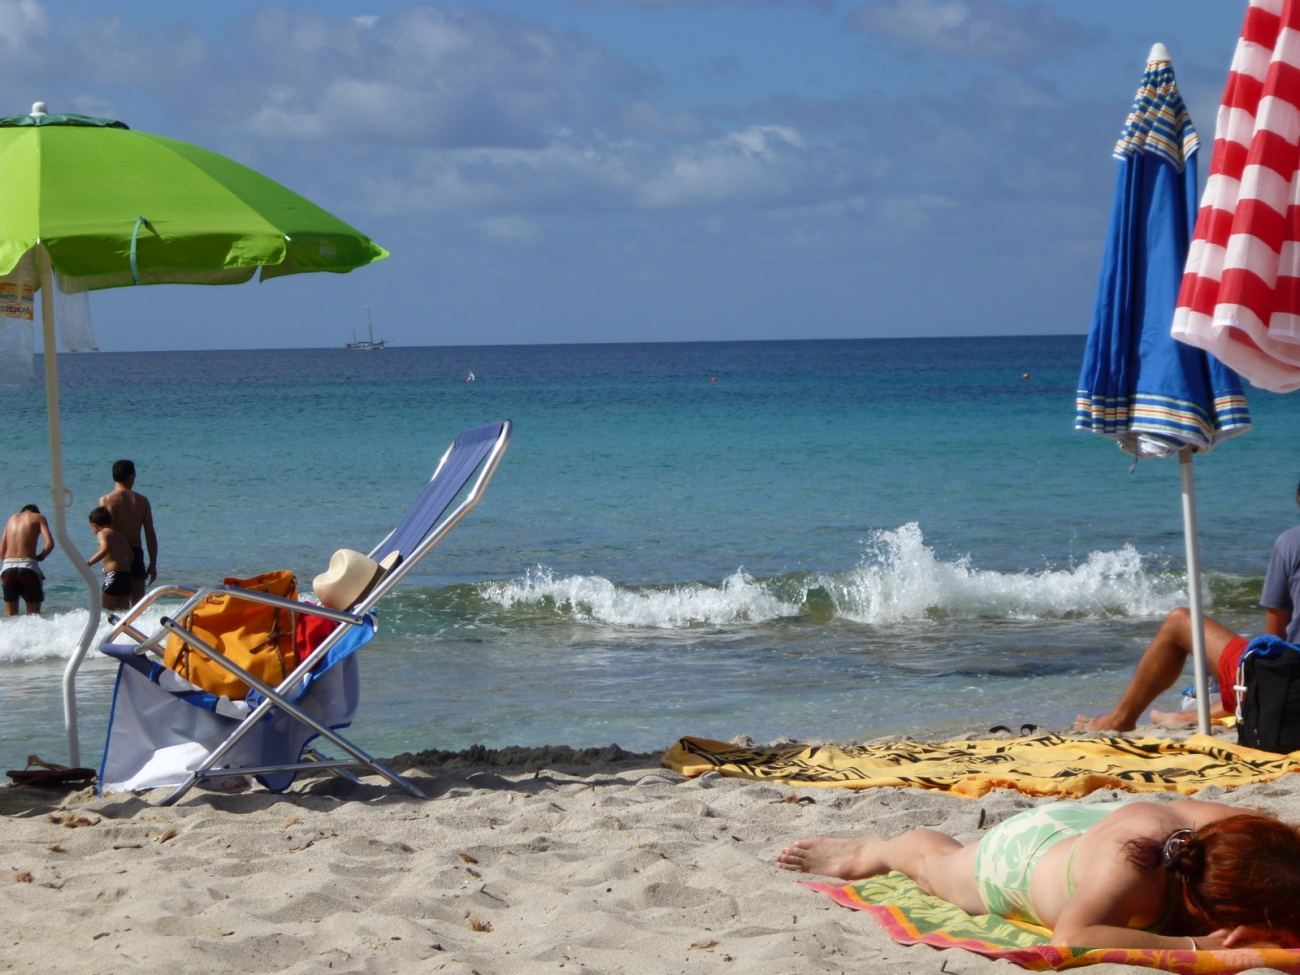 Le Bombarde beach, Alghero, Sardinia